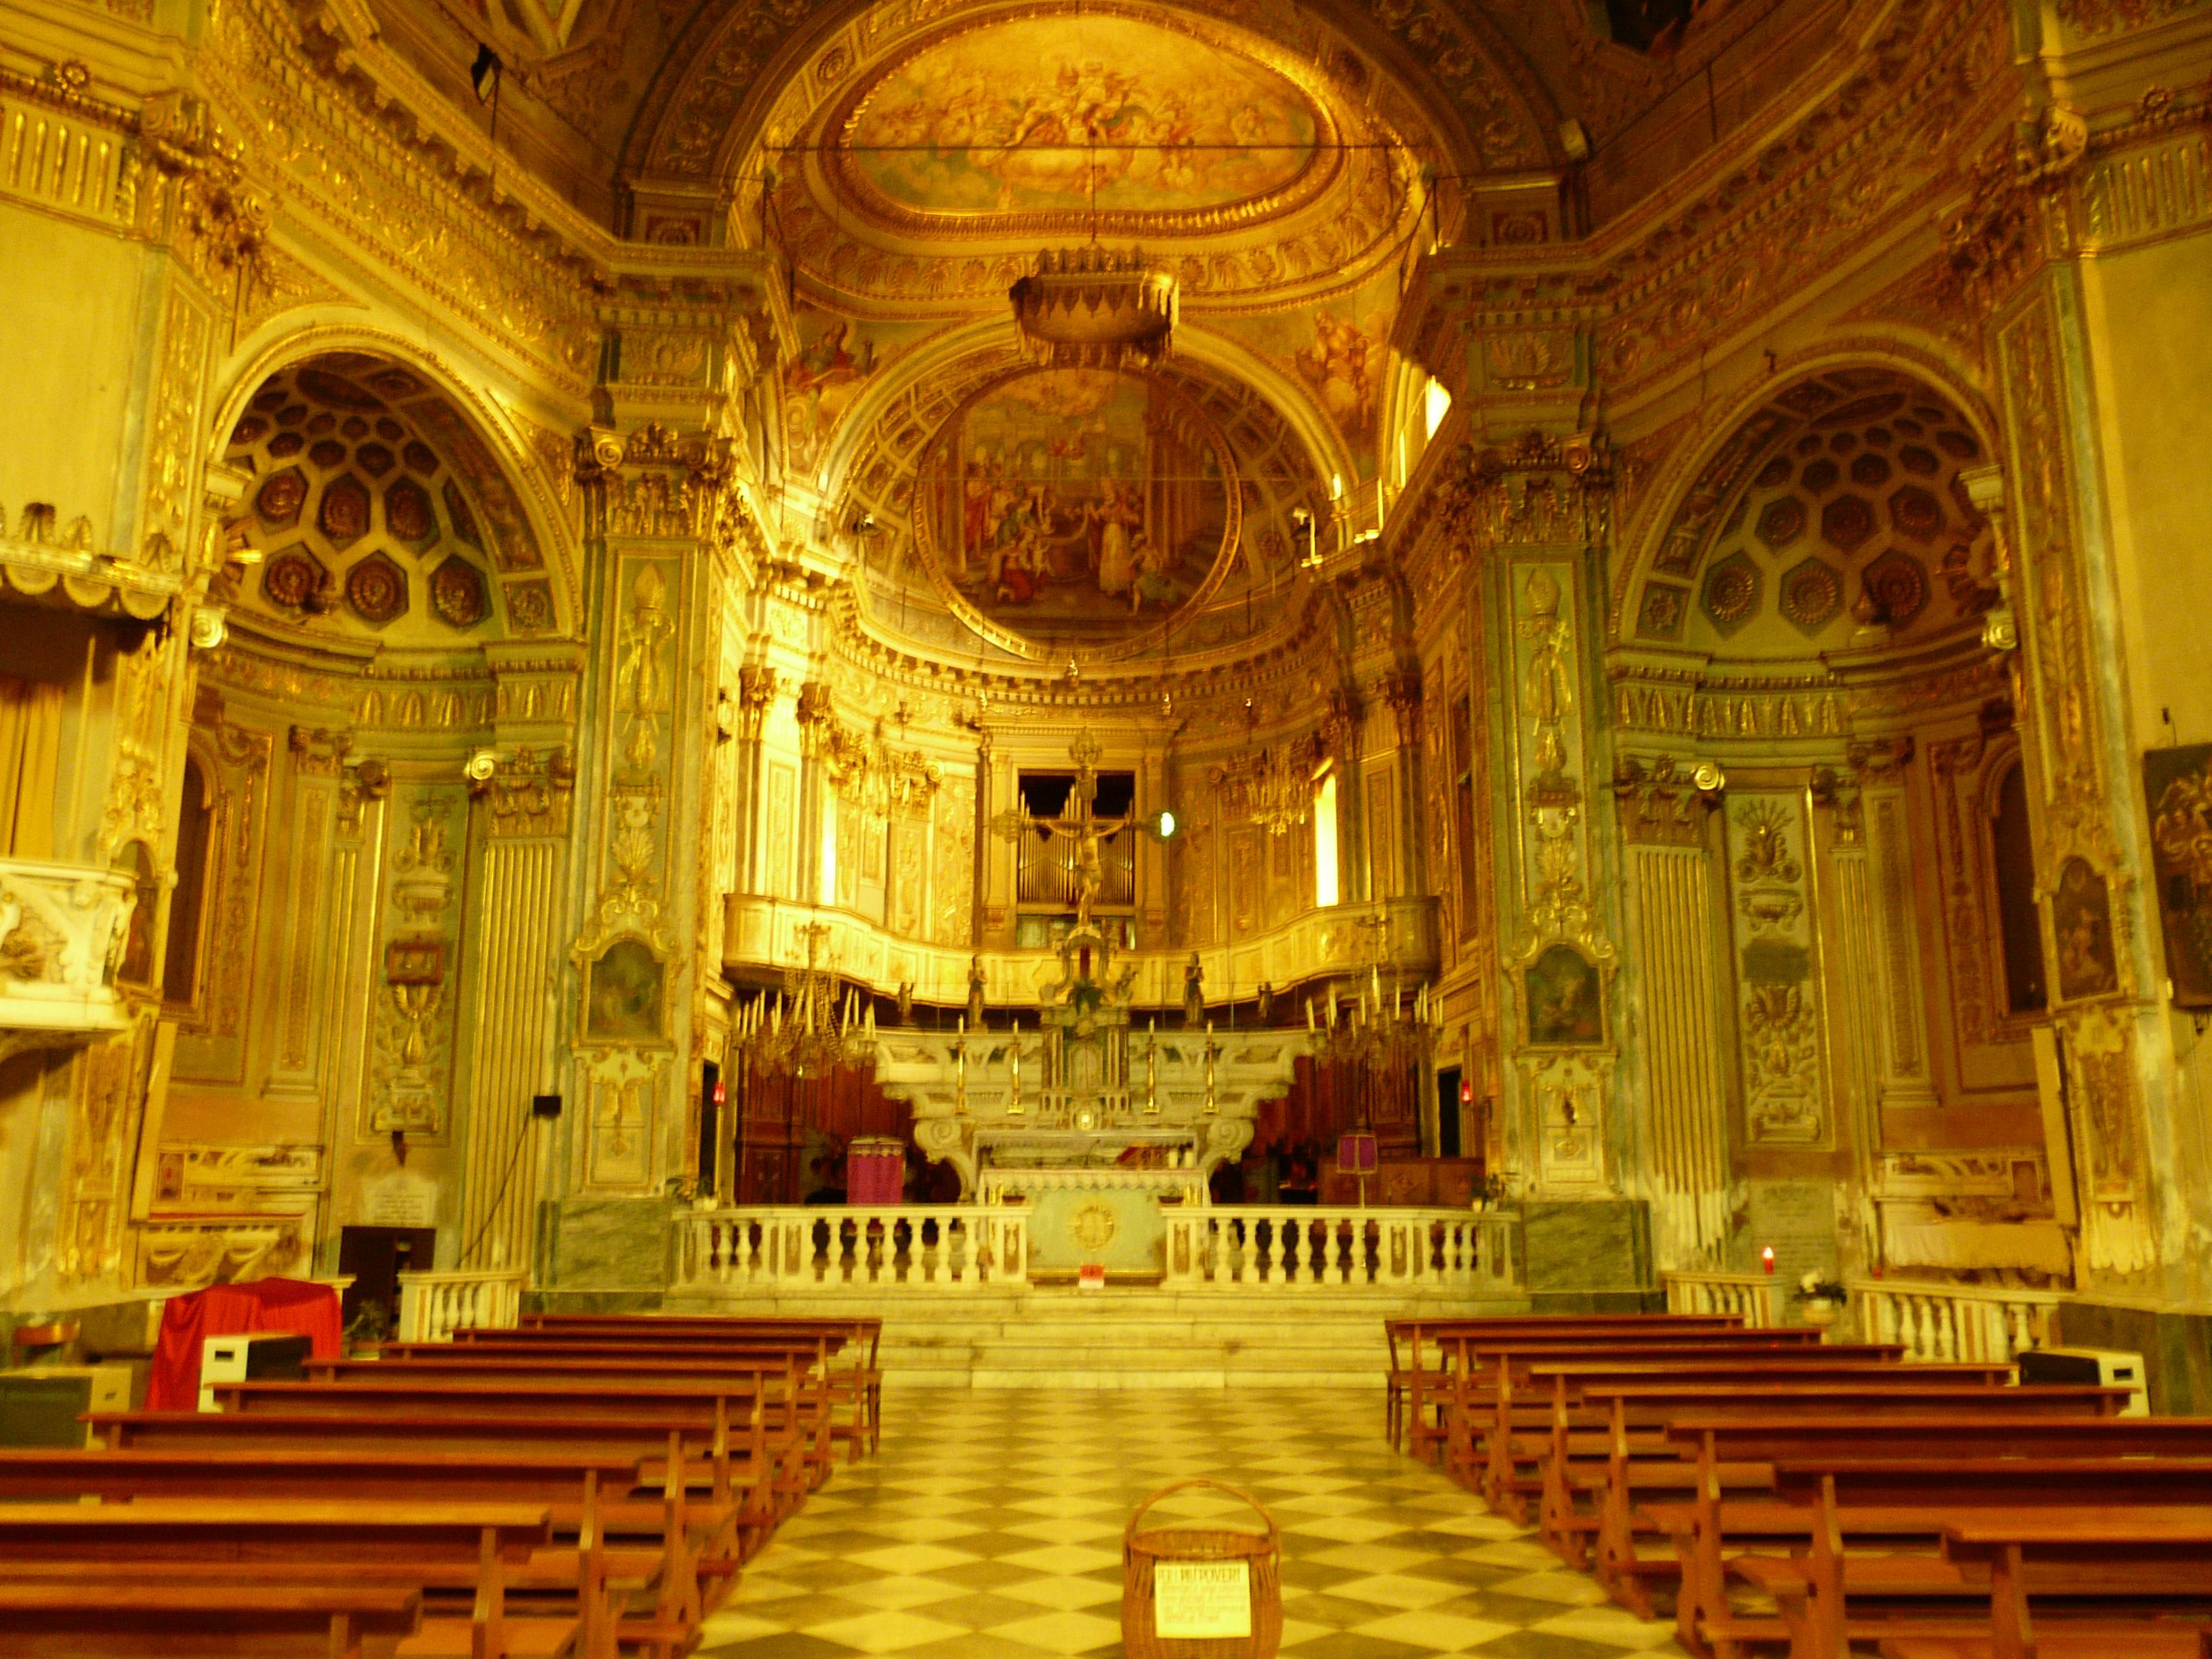 Calice - parrocchiale di San Nicolò